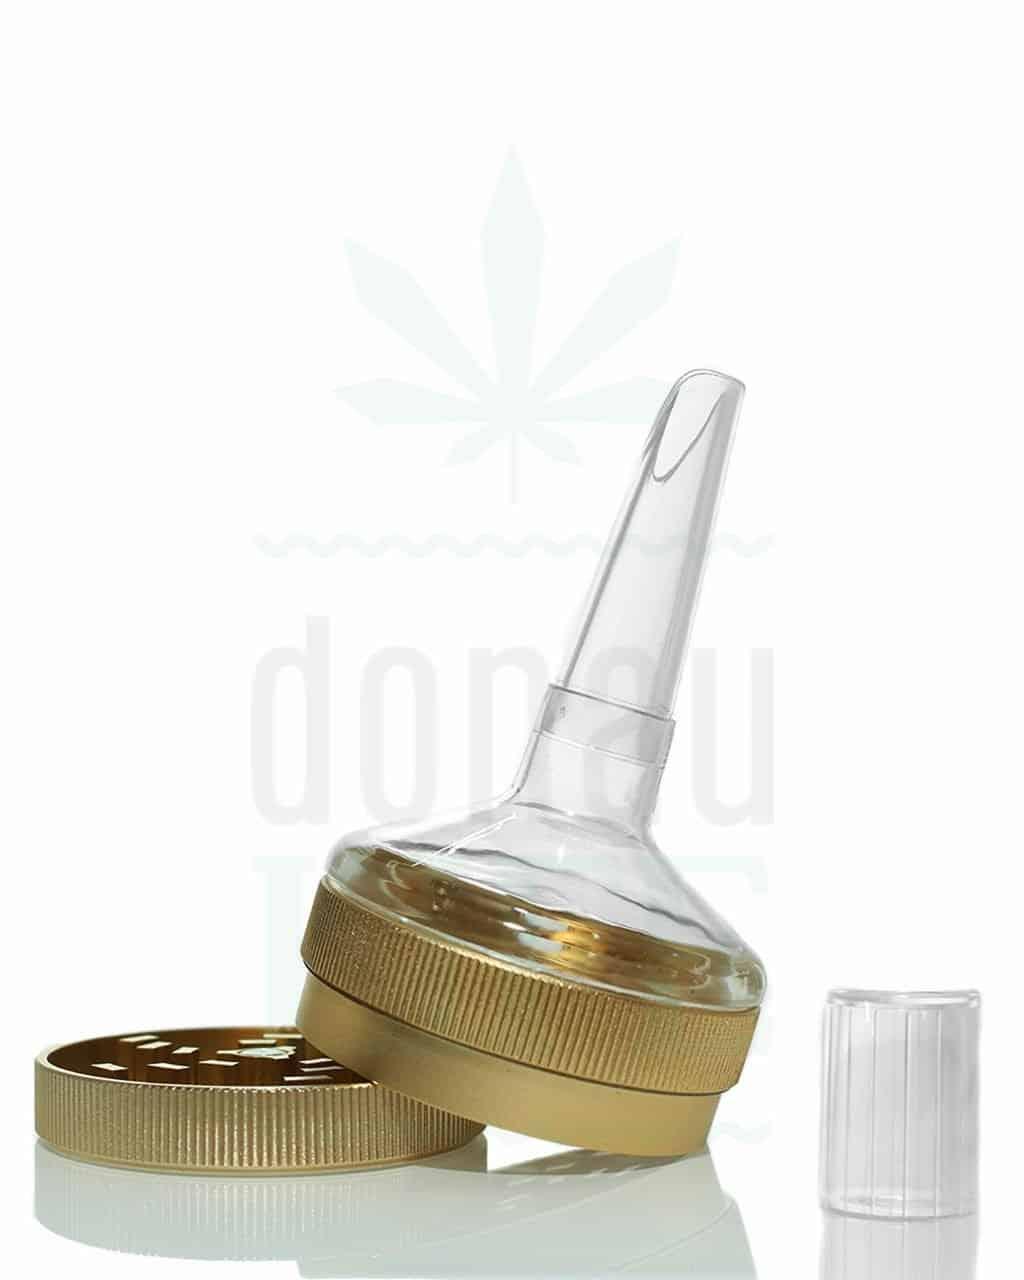 2-teilig ANAXY Seed Grinder gold 2-teilig | Ø 51 mm